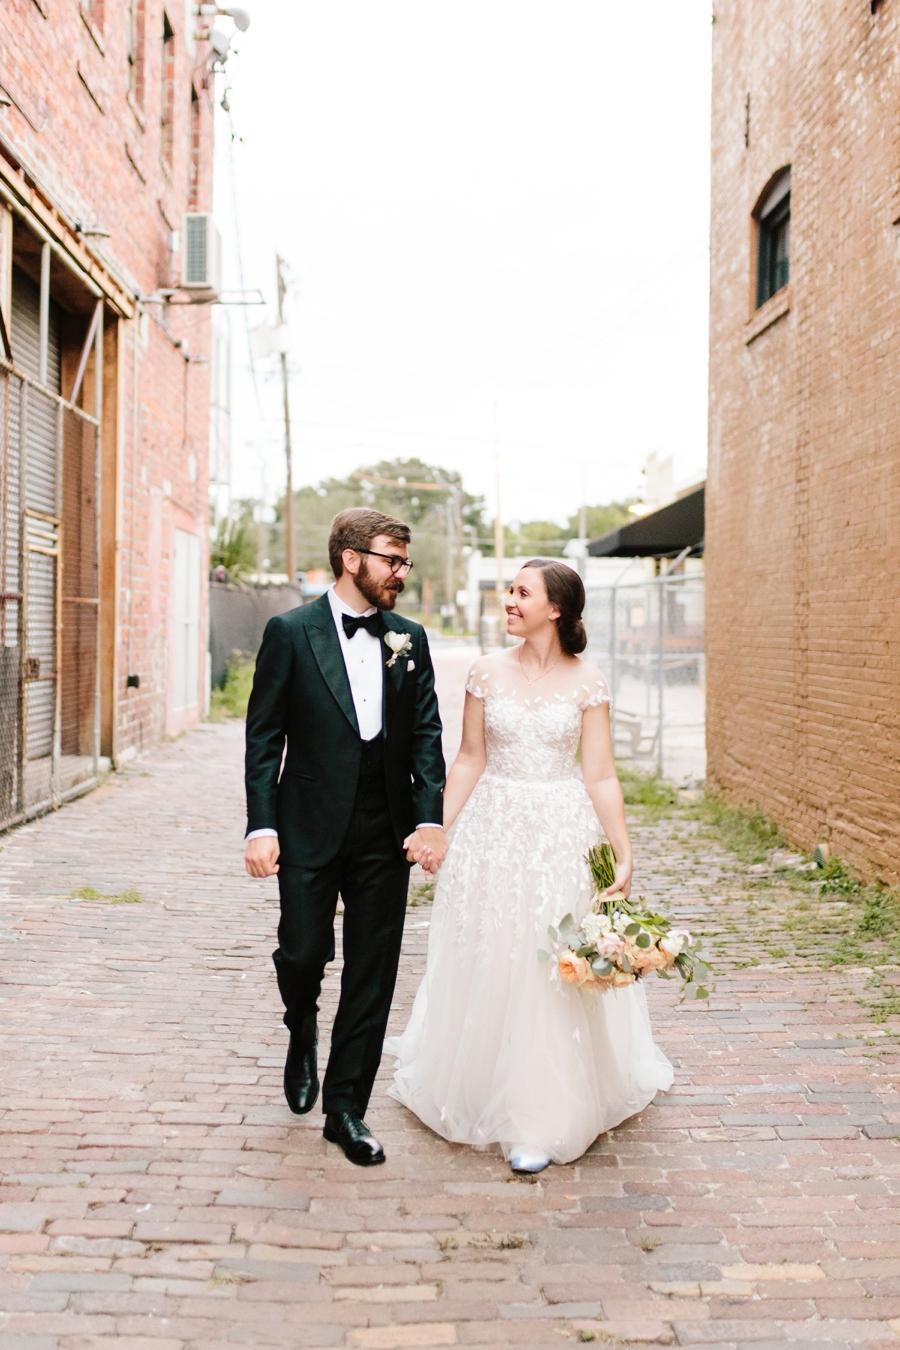 A Romantic Blush & Blue Tampa Wedding via TheELD.com A Romantic Blush & Blue Tampa Wedding - A Romantic Blush Blue Tampa Wedding 0024 - A Romantic Blush & Blue Tampa Wedding